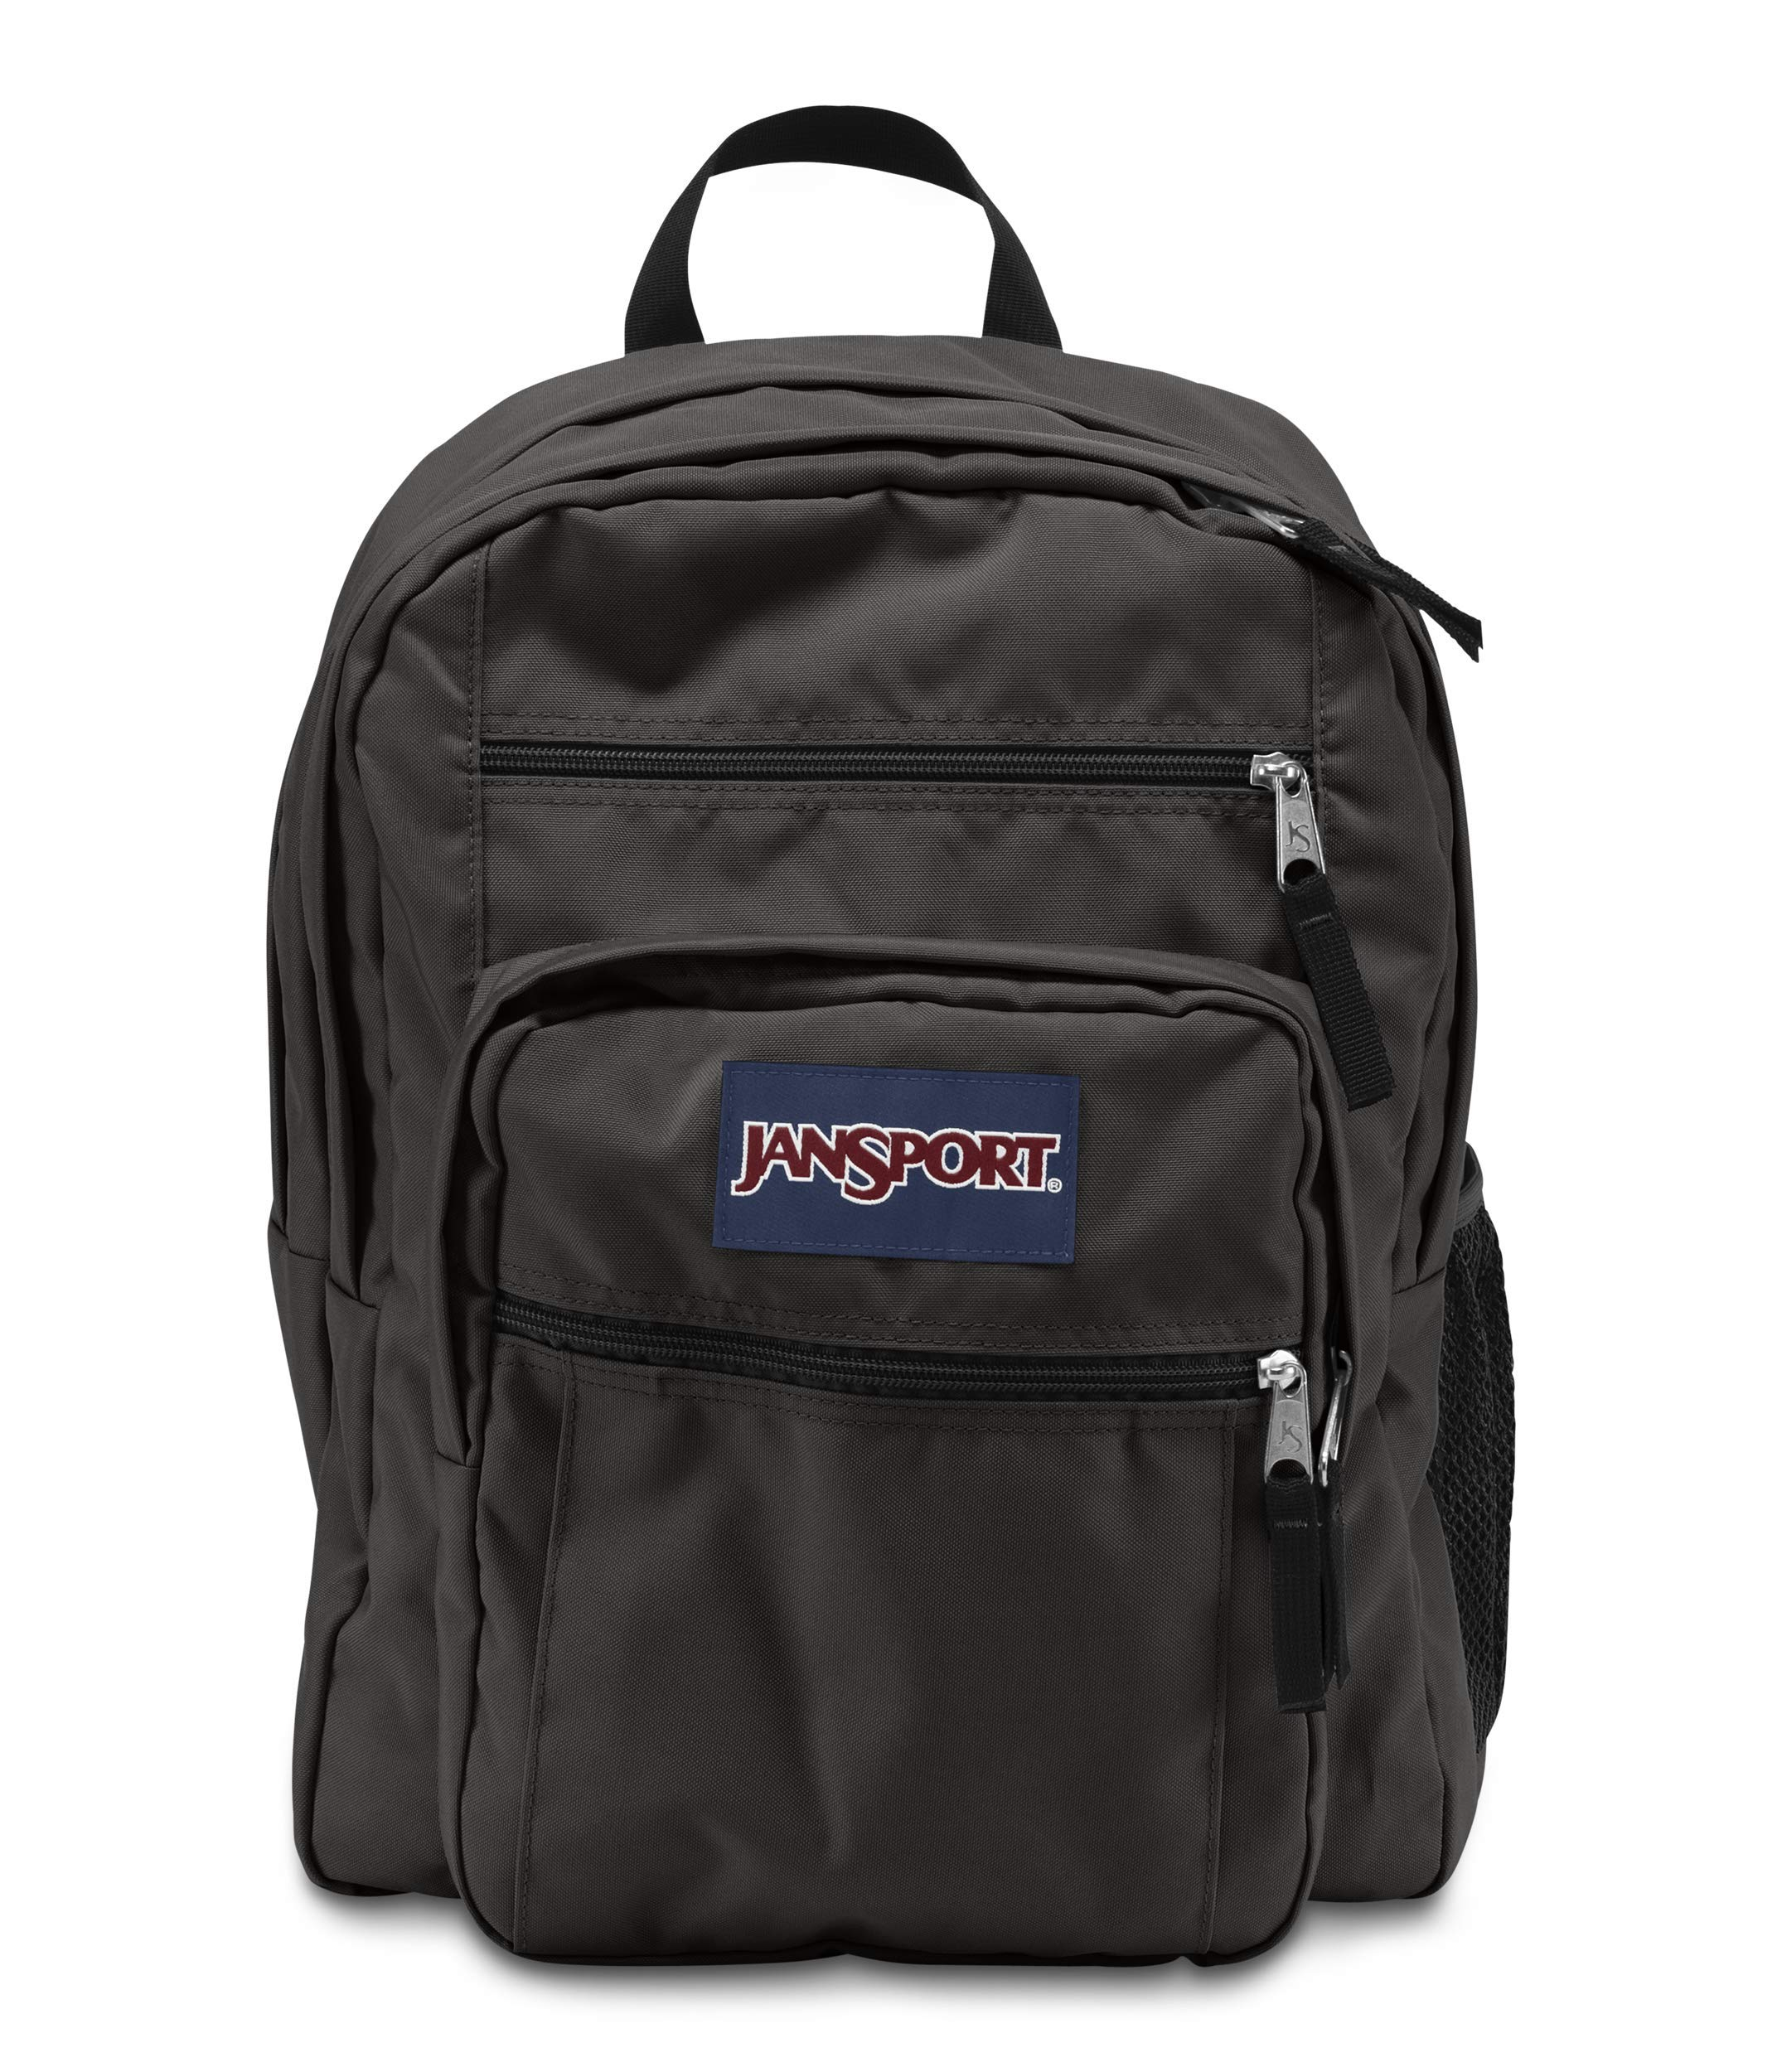 JanSport Big Student Classics Series Backpack - Forge Grey